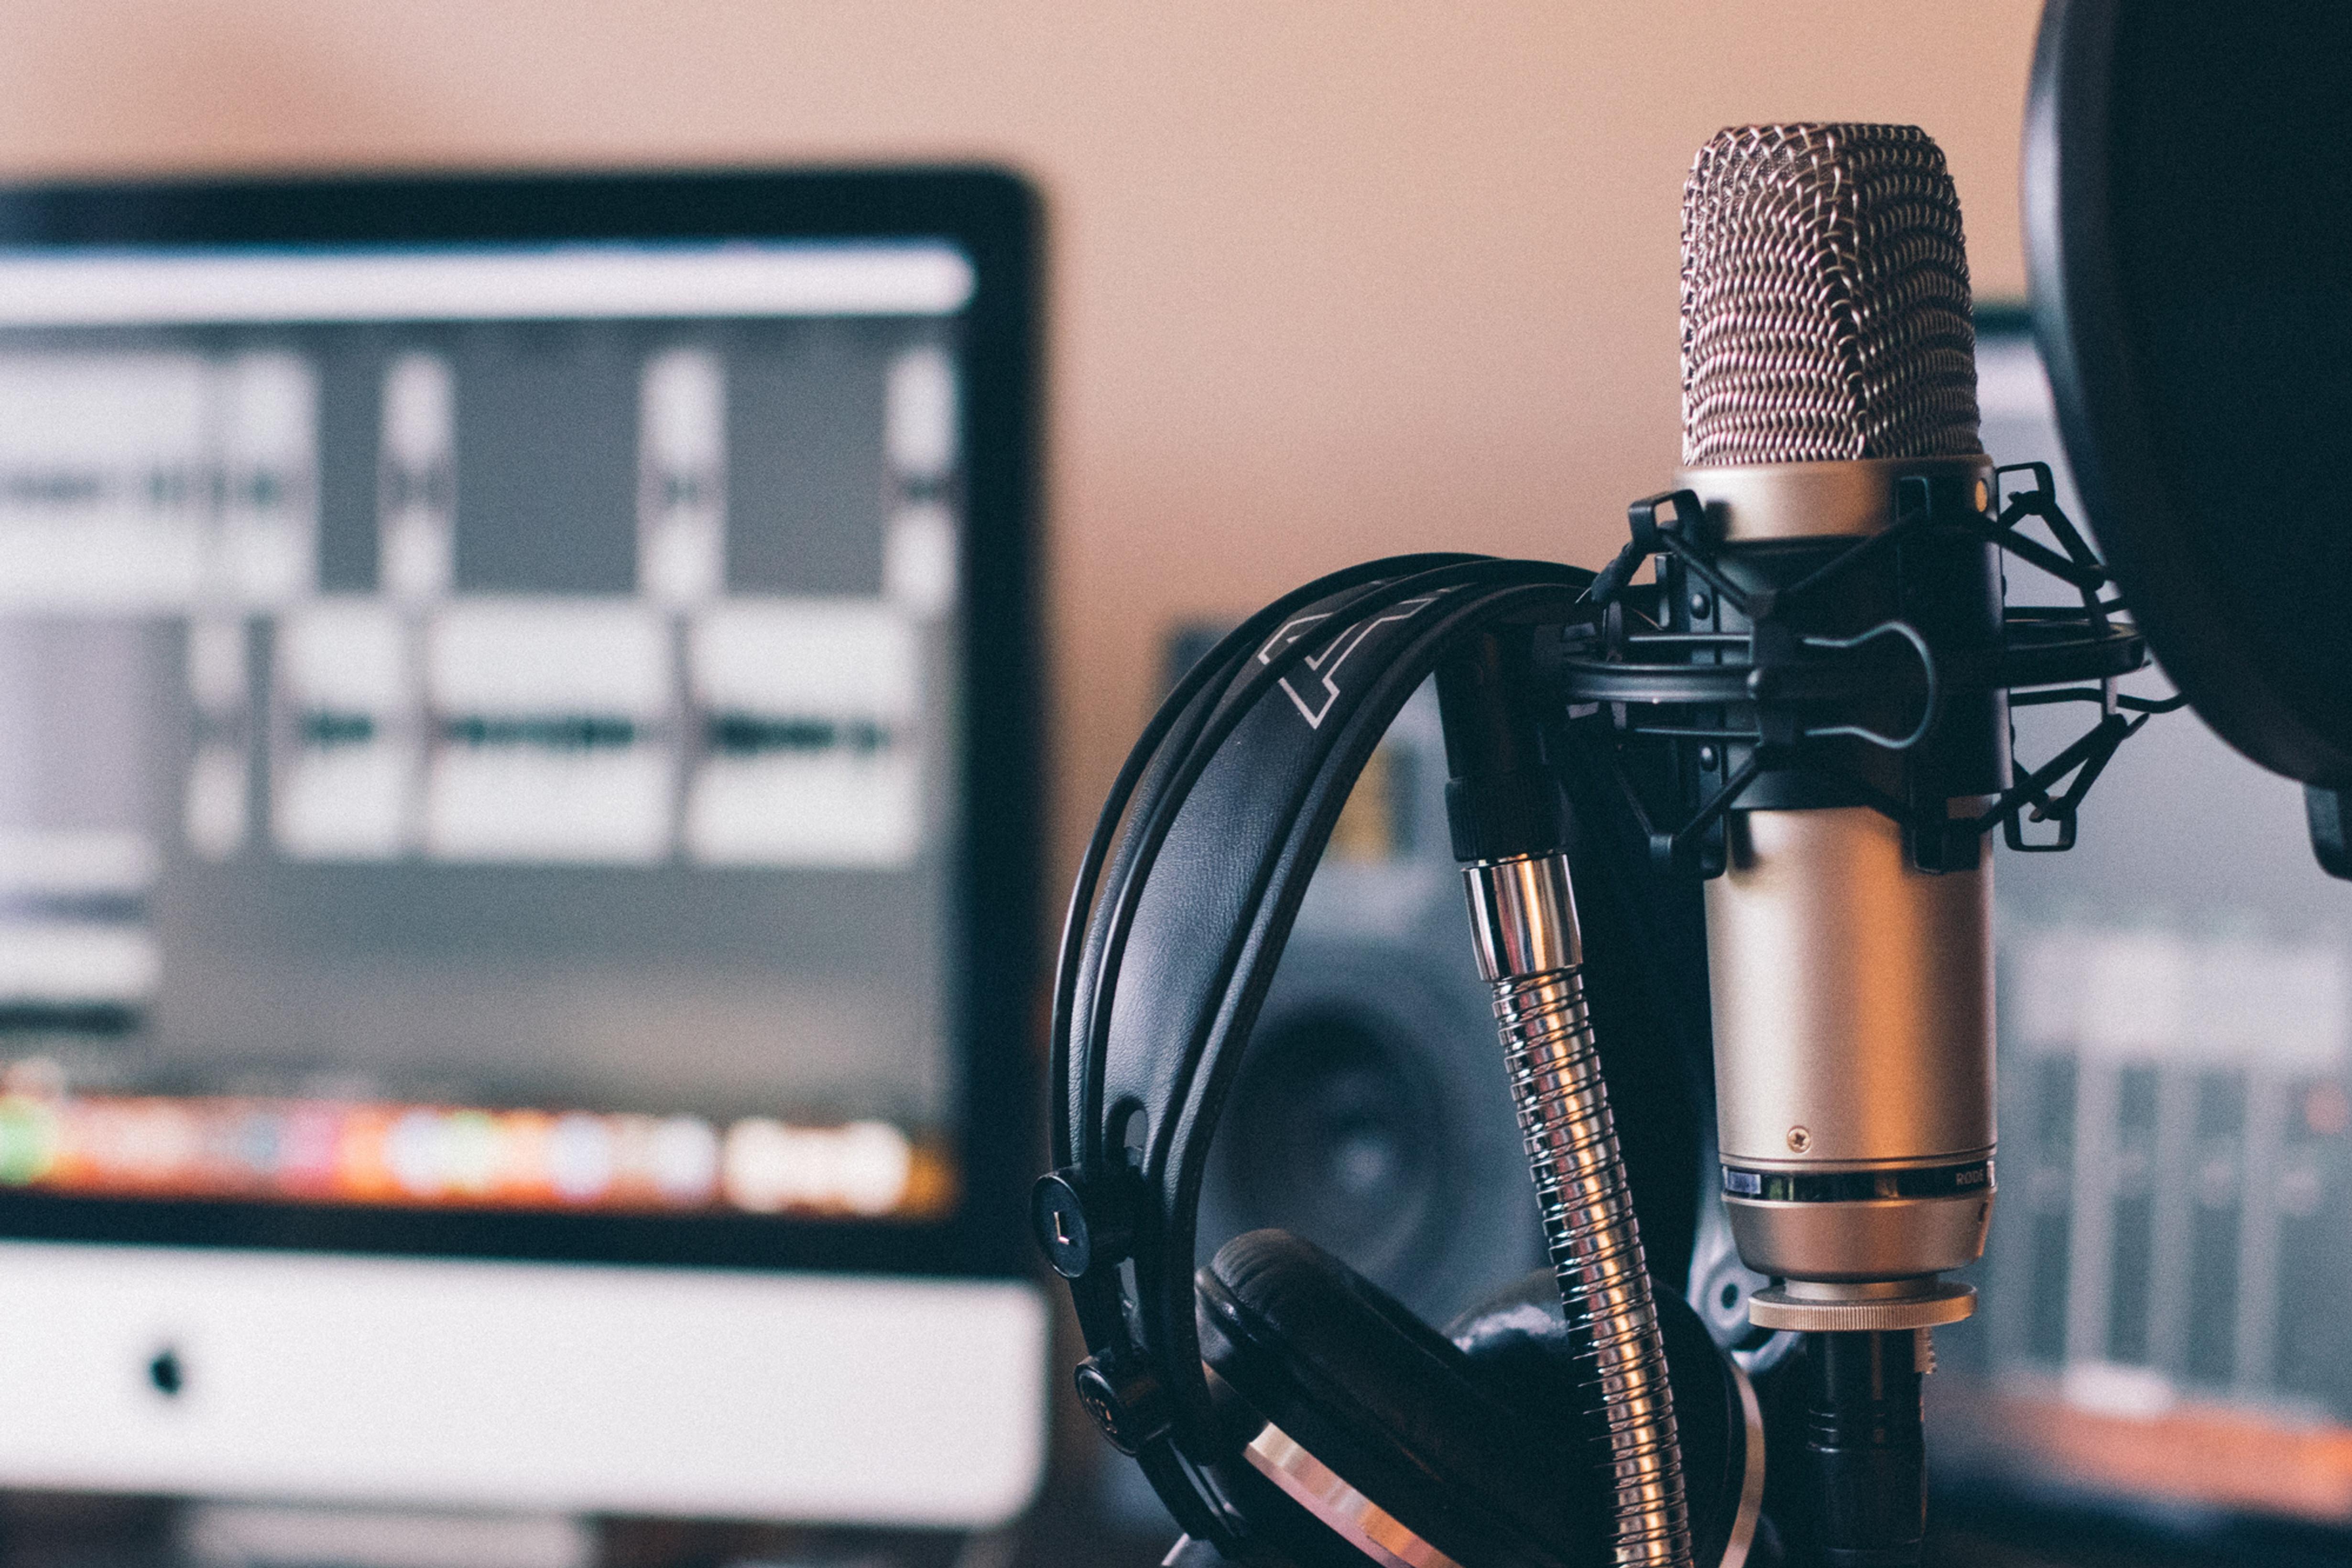 Podcast Editing (20-60mins of audio)